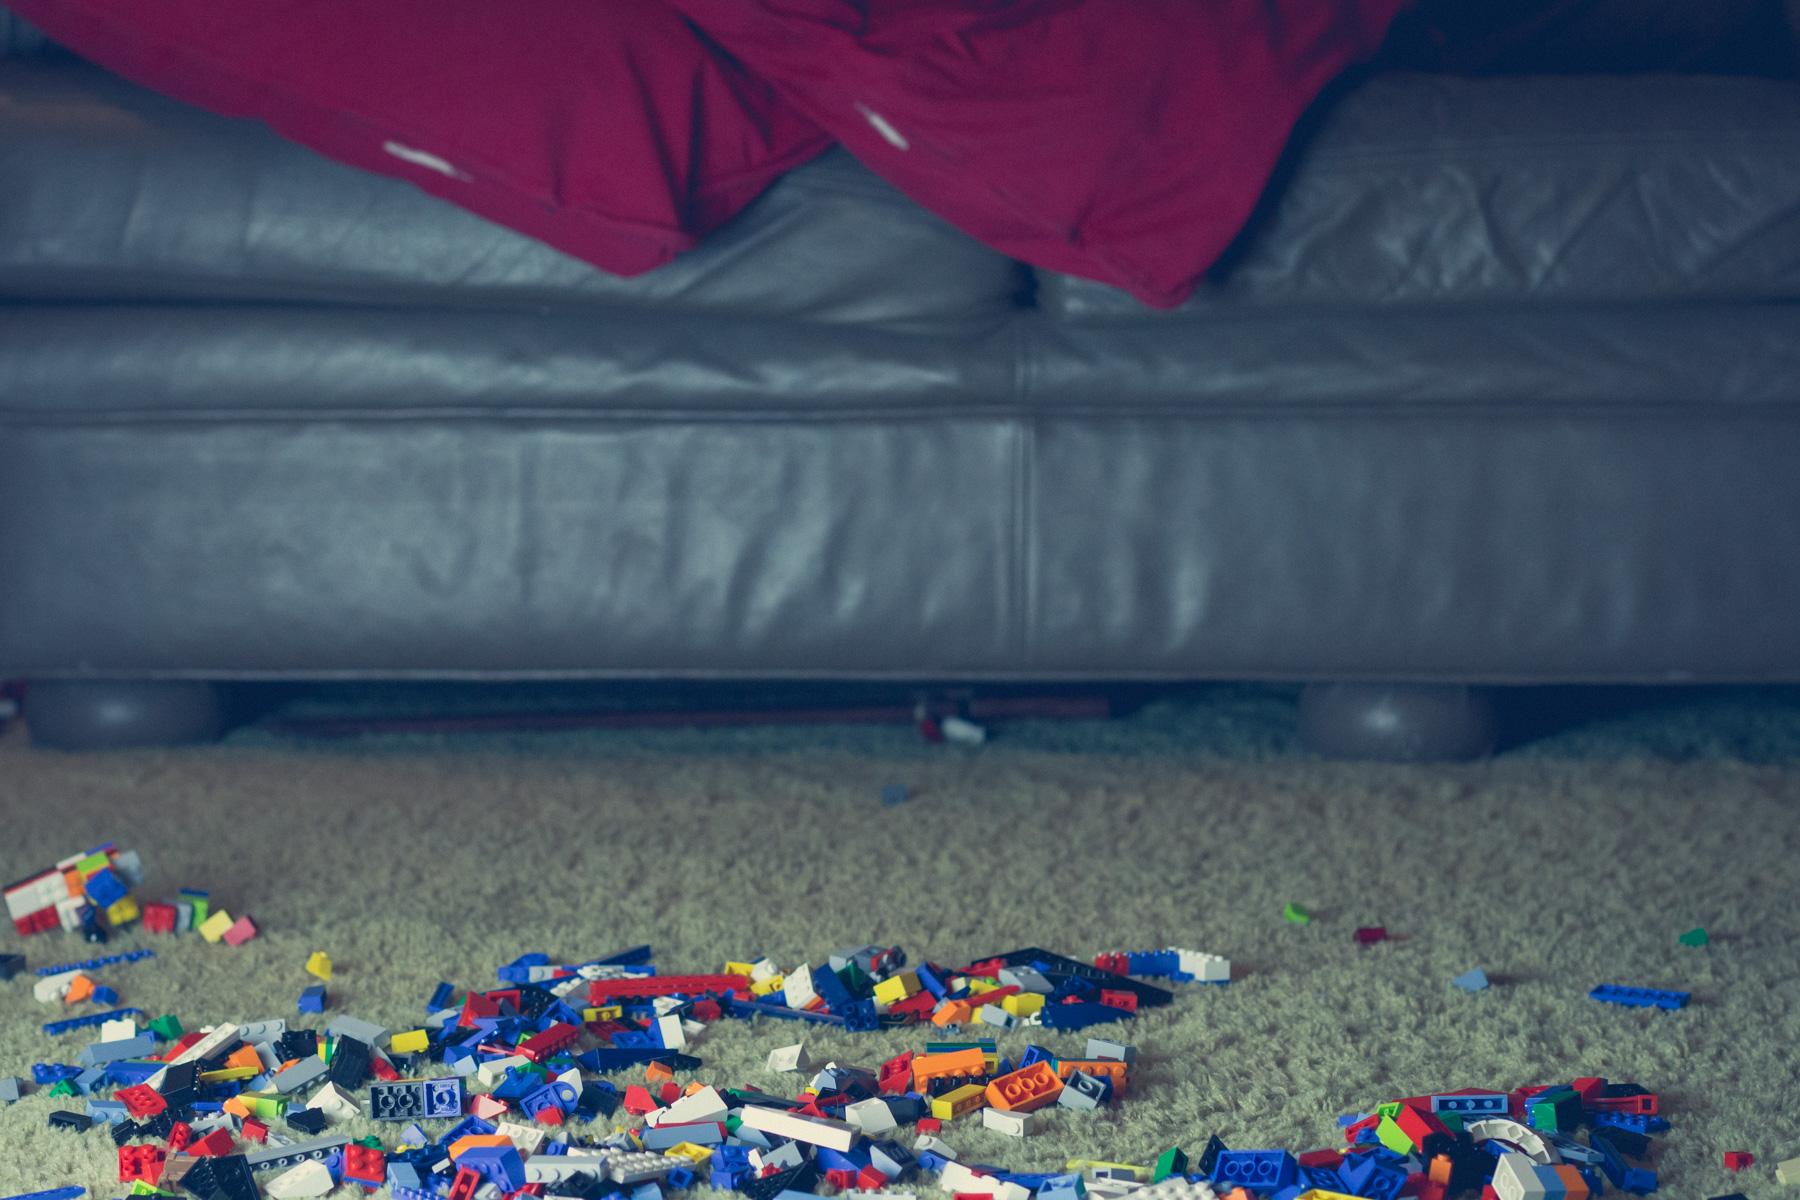 Thirty four million LEGO bricks left on living room floor by beastly children.